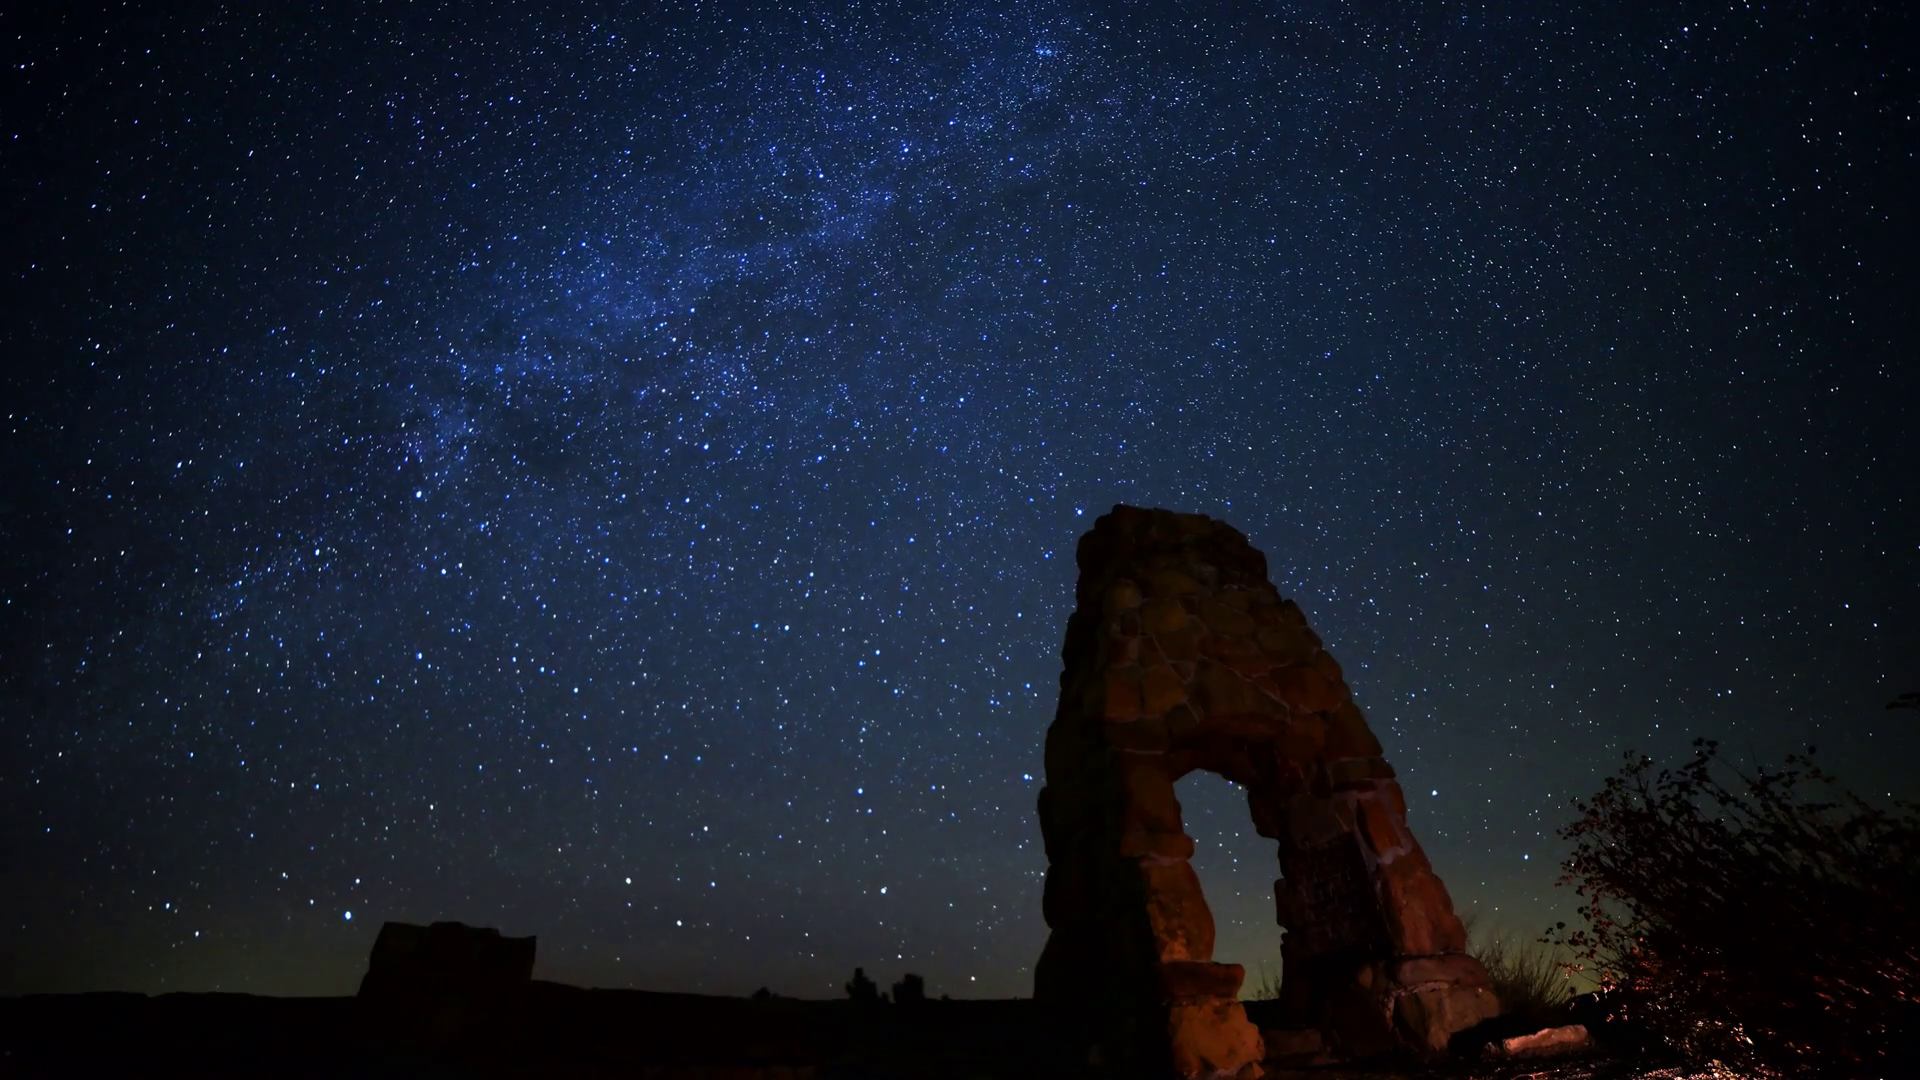 Milky Way Galaxy Over Abandoned Scenic Ruin